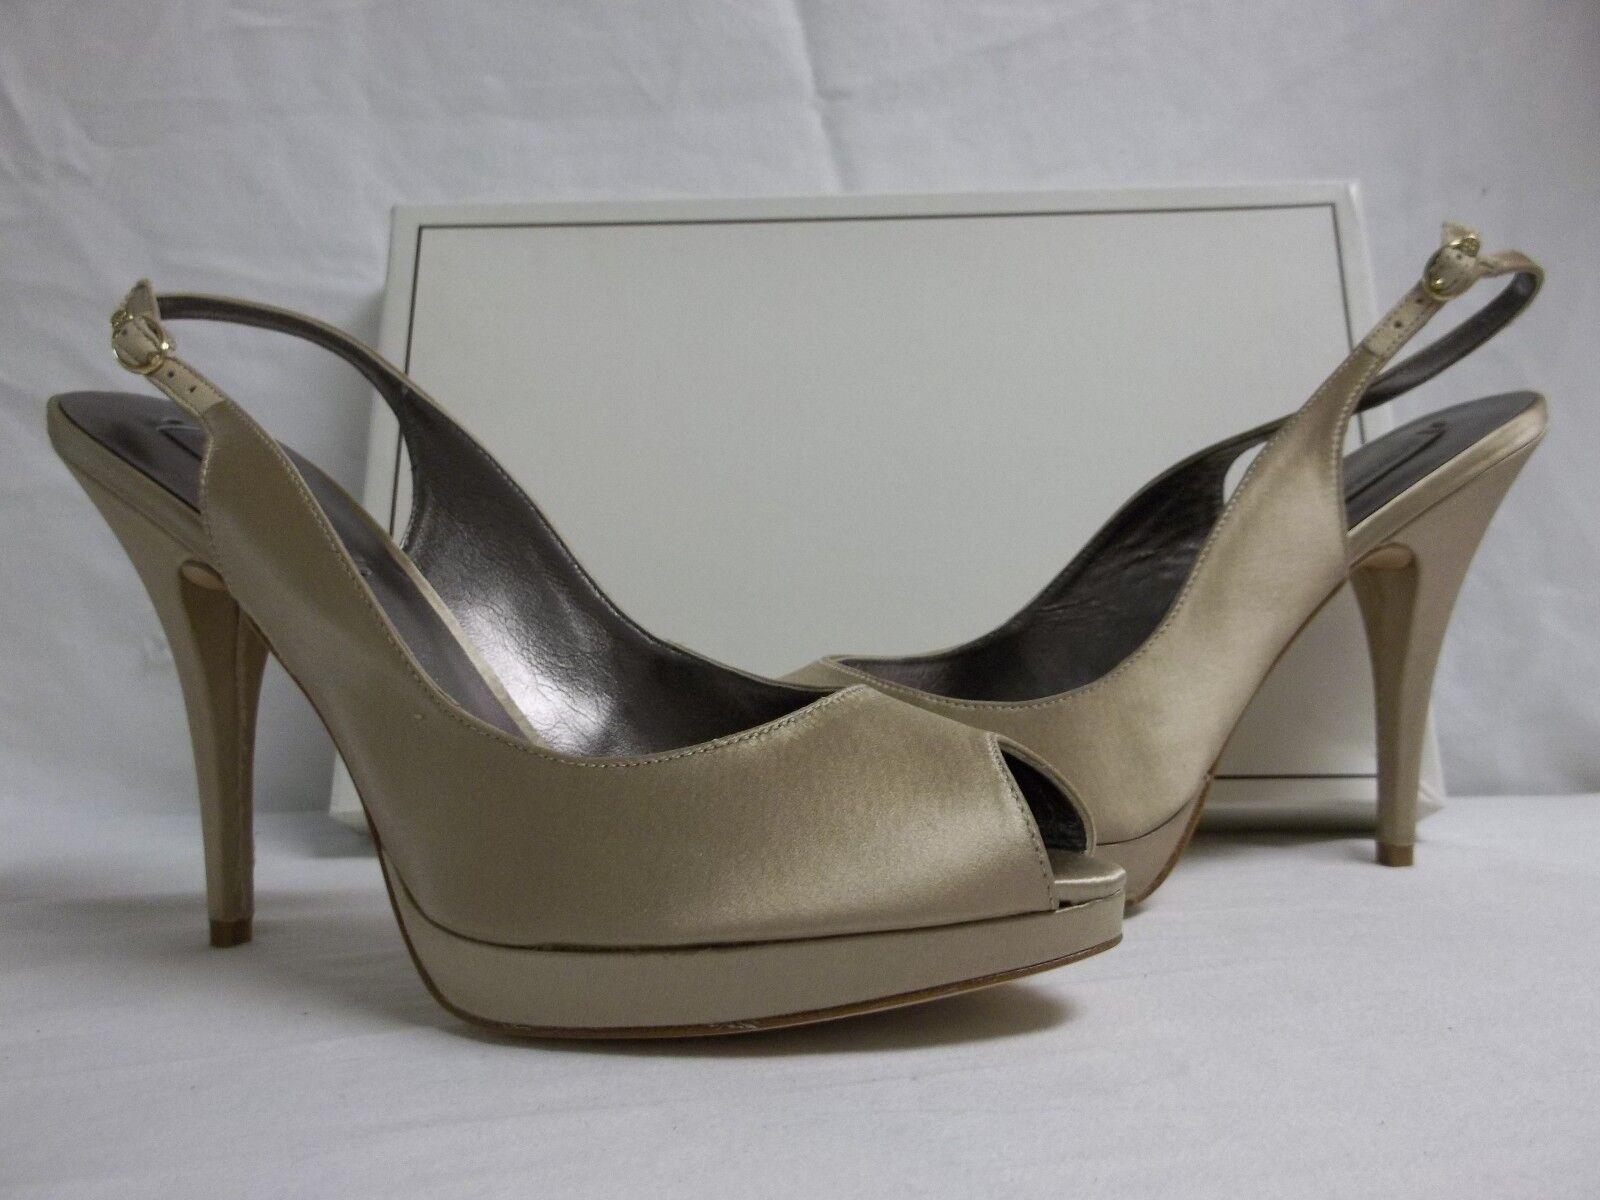 BCBG Max Azria Sz 9.5 M Libby Champagne Satin Slingbacks Heels NEU Damenschuhe Schuhes